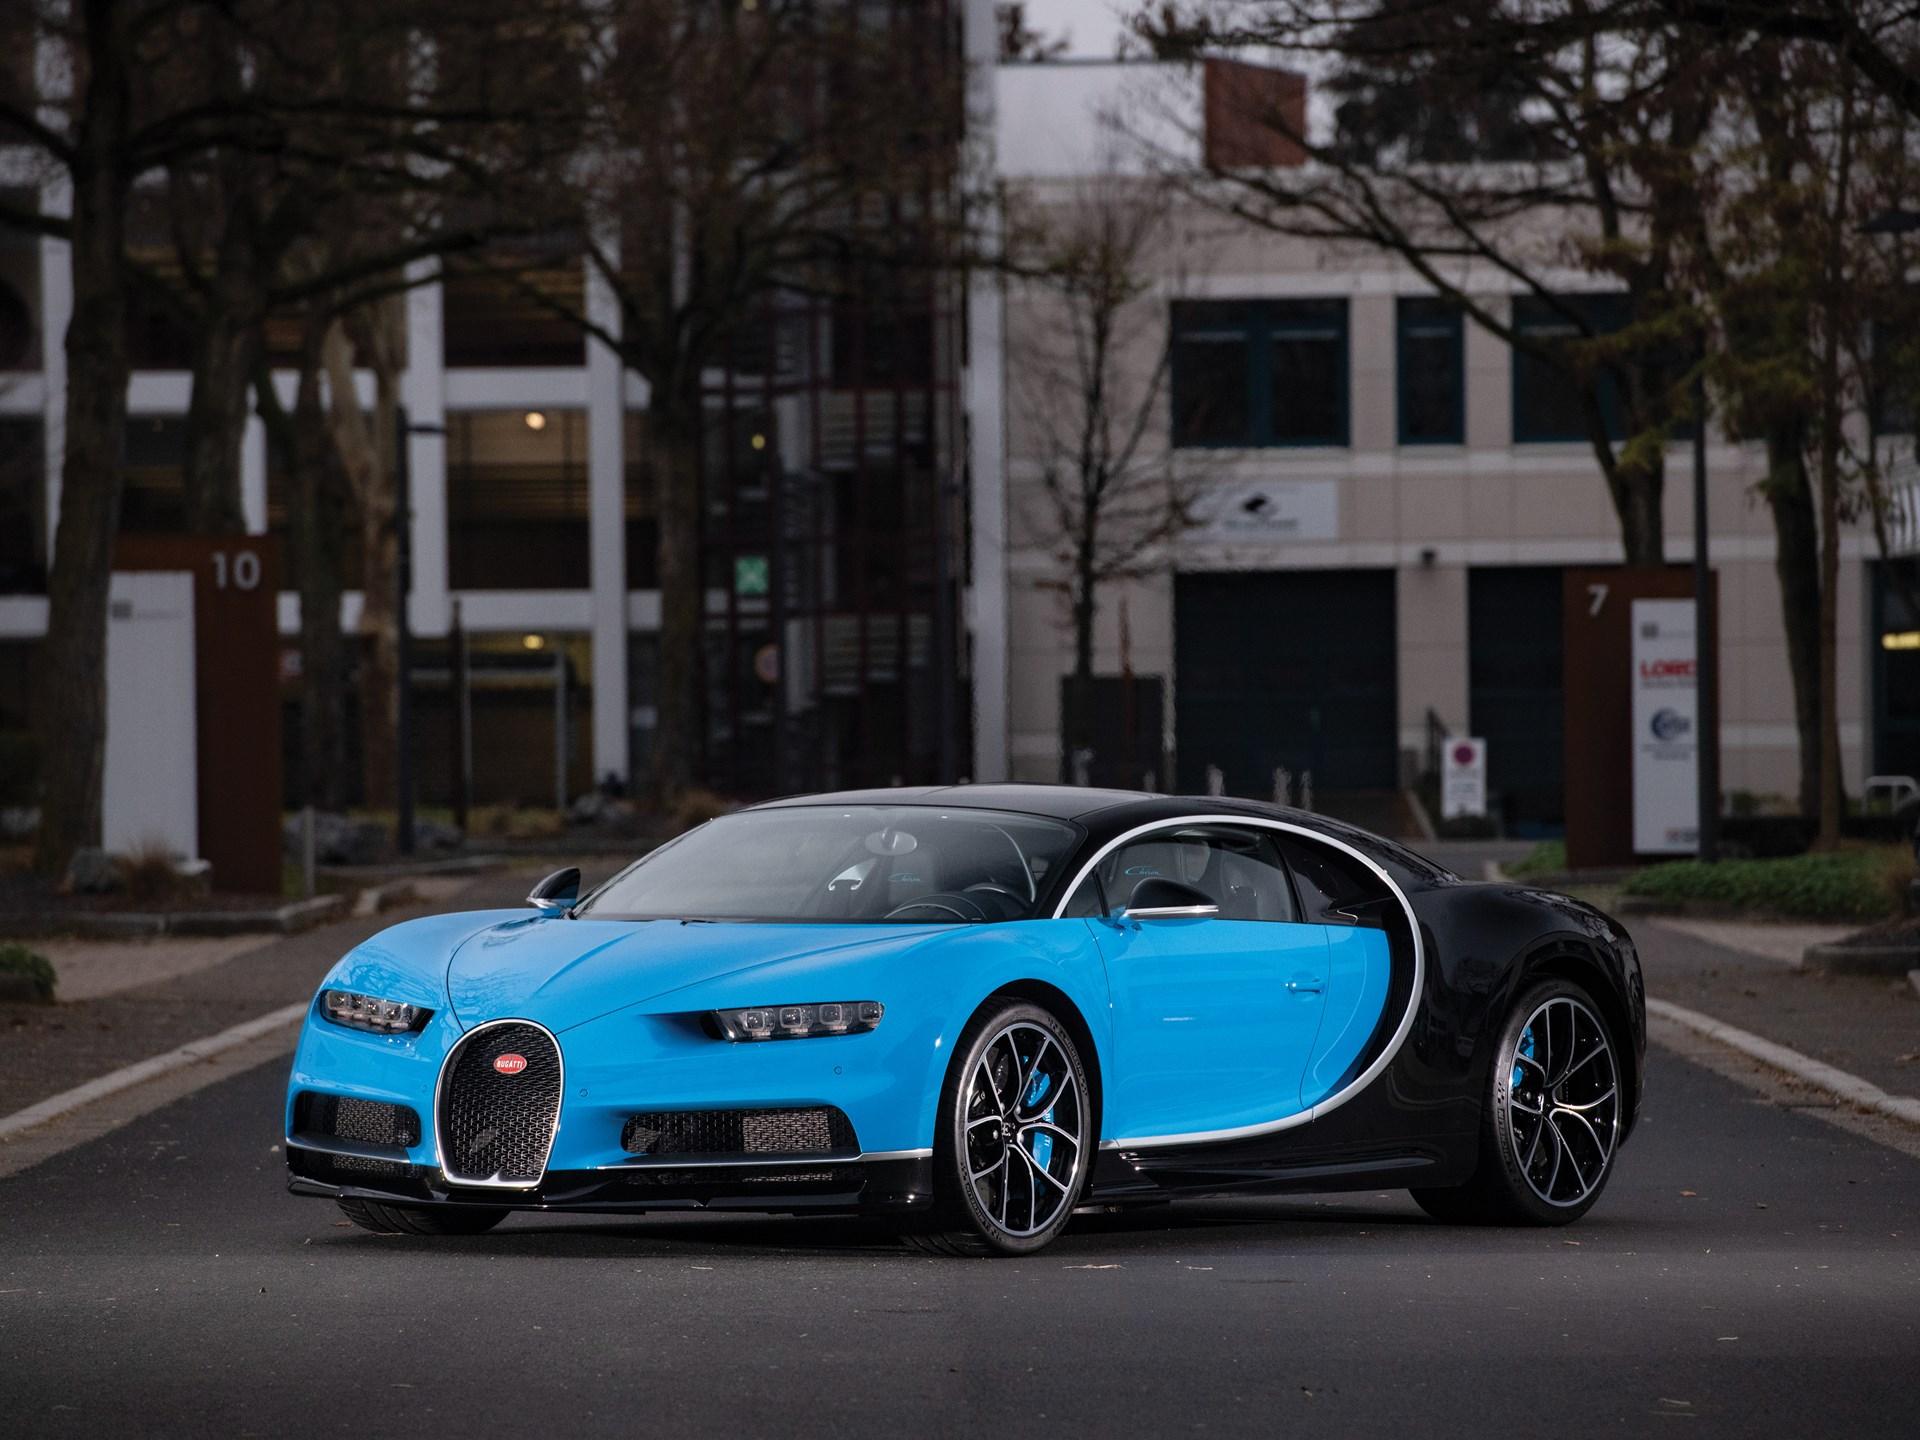 RM Sotheby's - 2018 Bugatti Chiron | Paris 2019